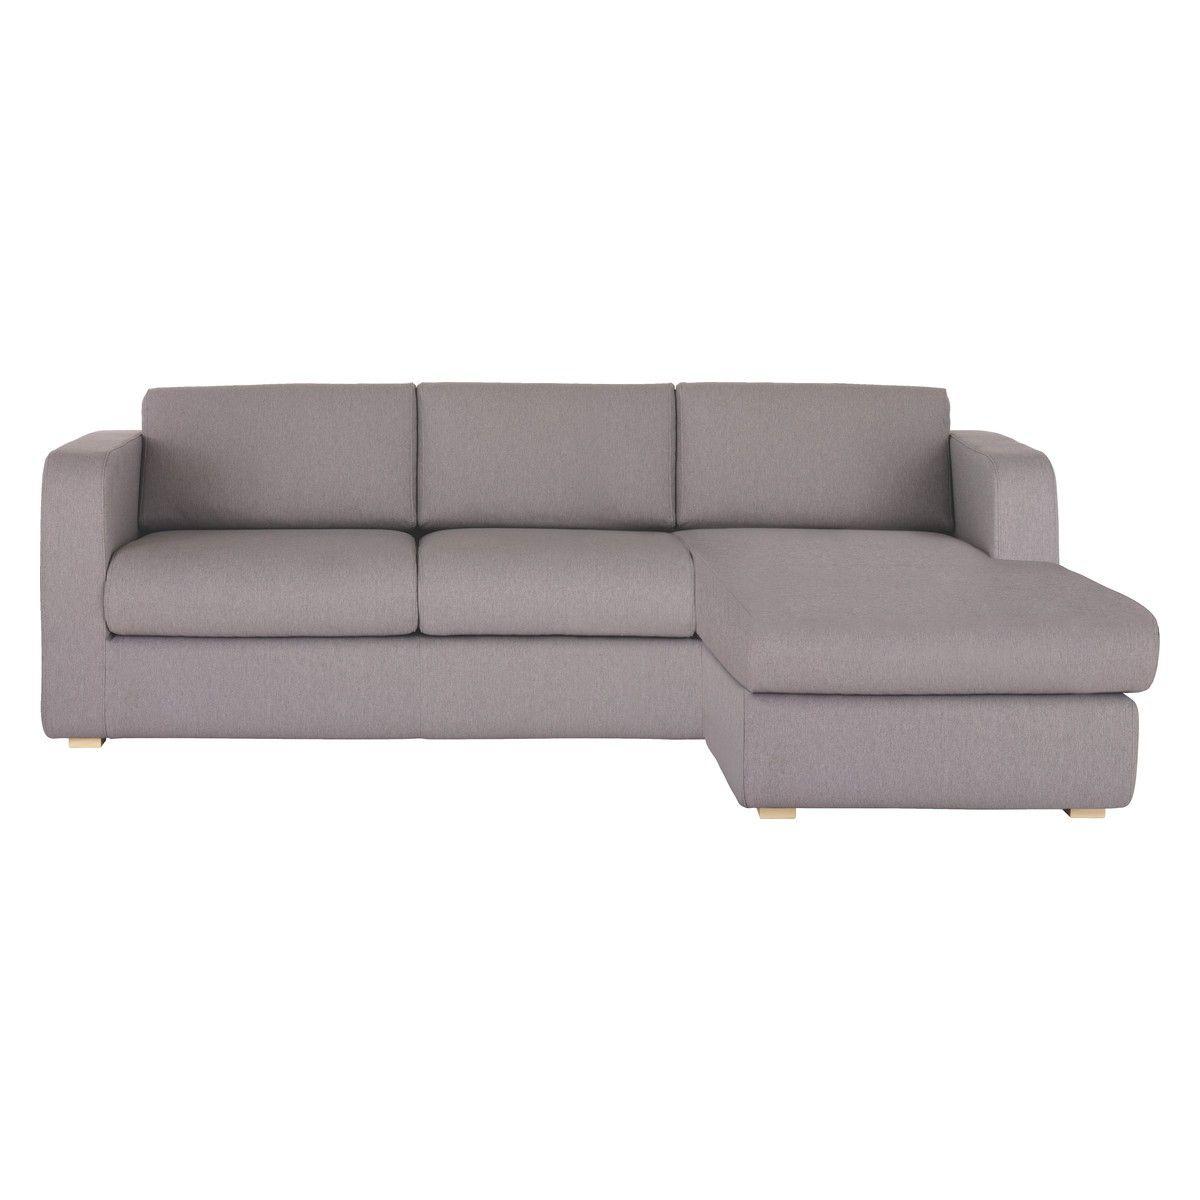 Porto Grey Fabric Reversible Chaise Sofa Bed Chaise Sofa Sofa Bed Sofa Upholstery